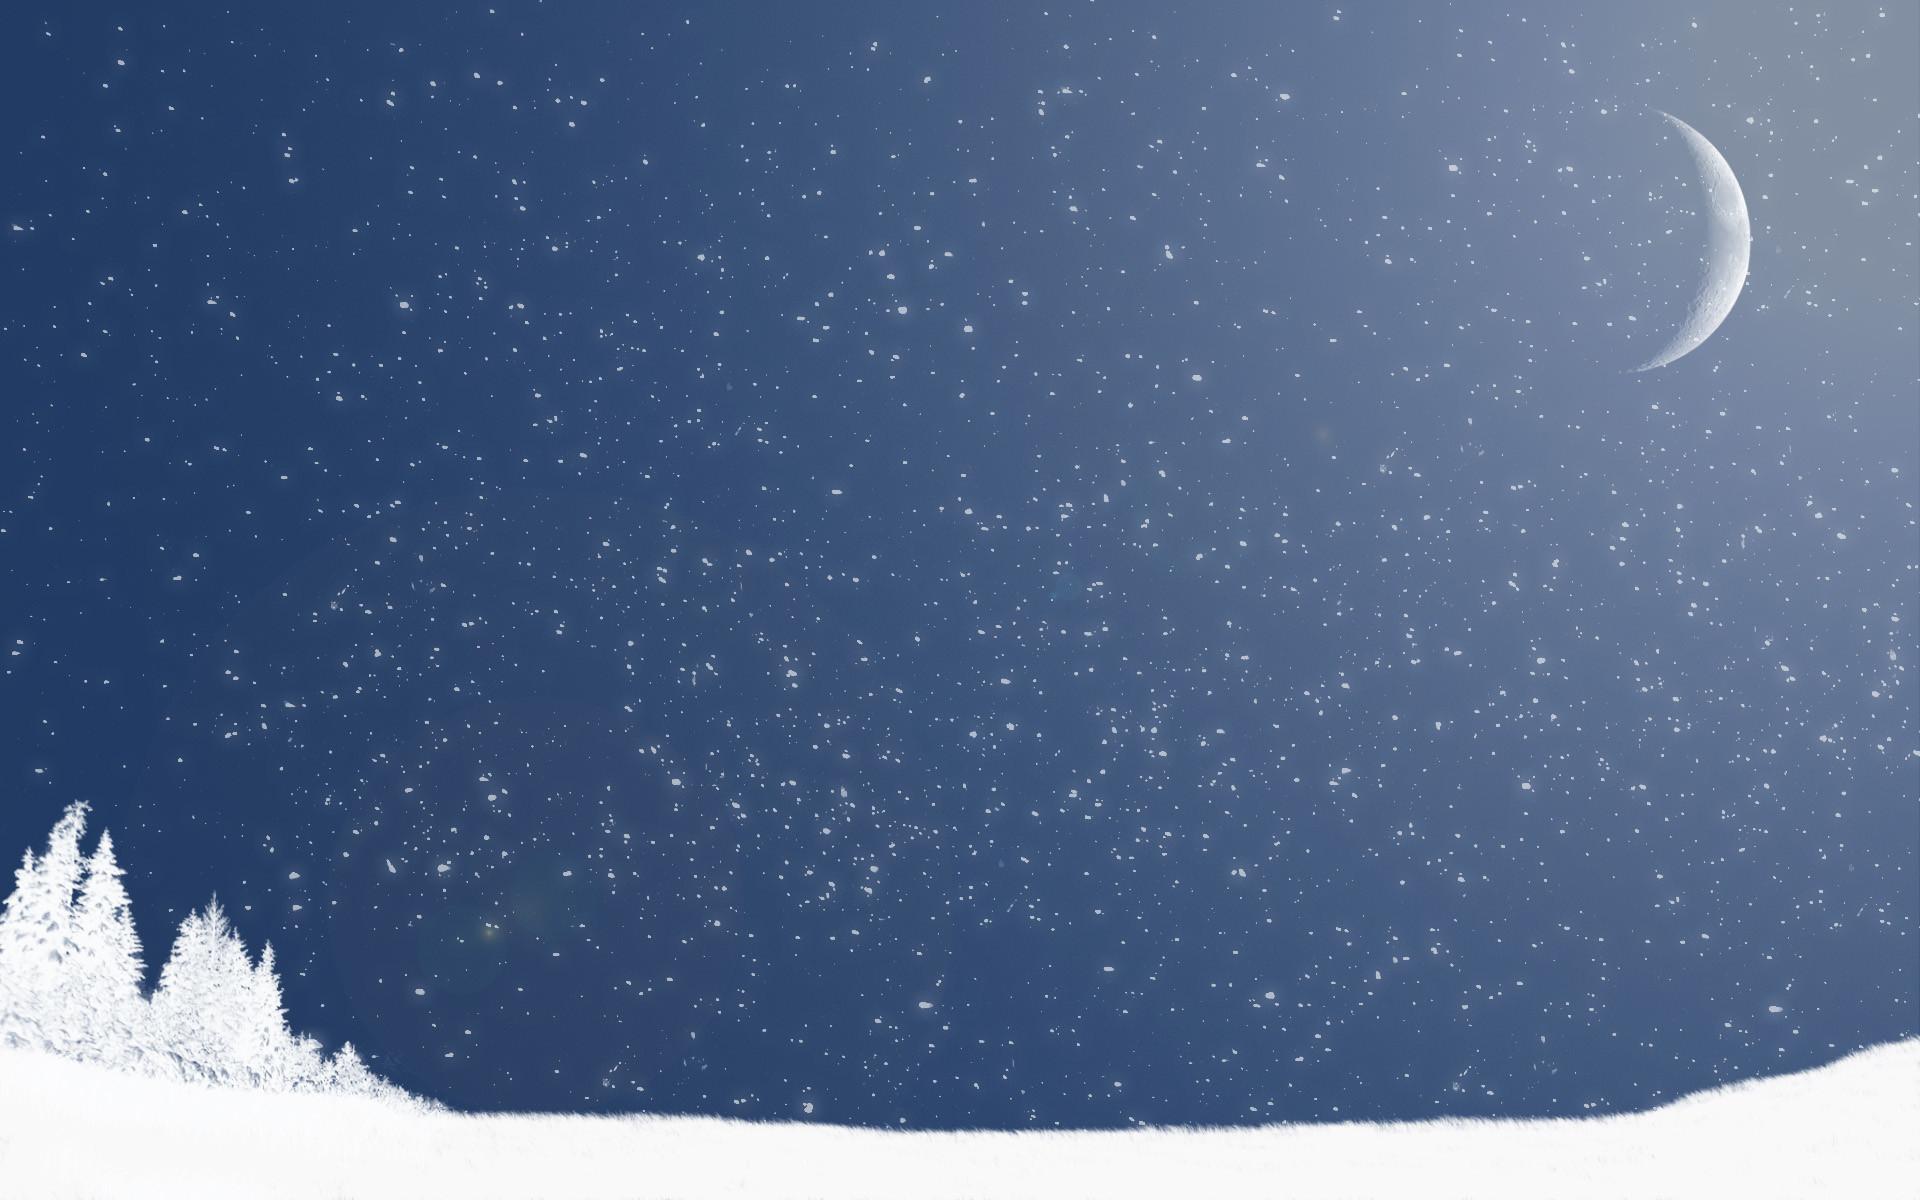 Winter Wallpaper 21